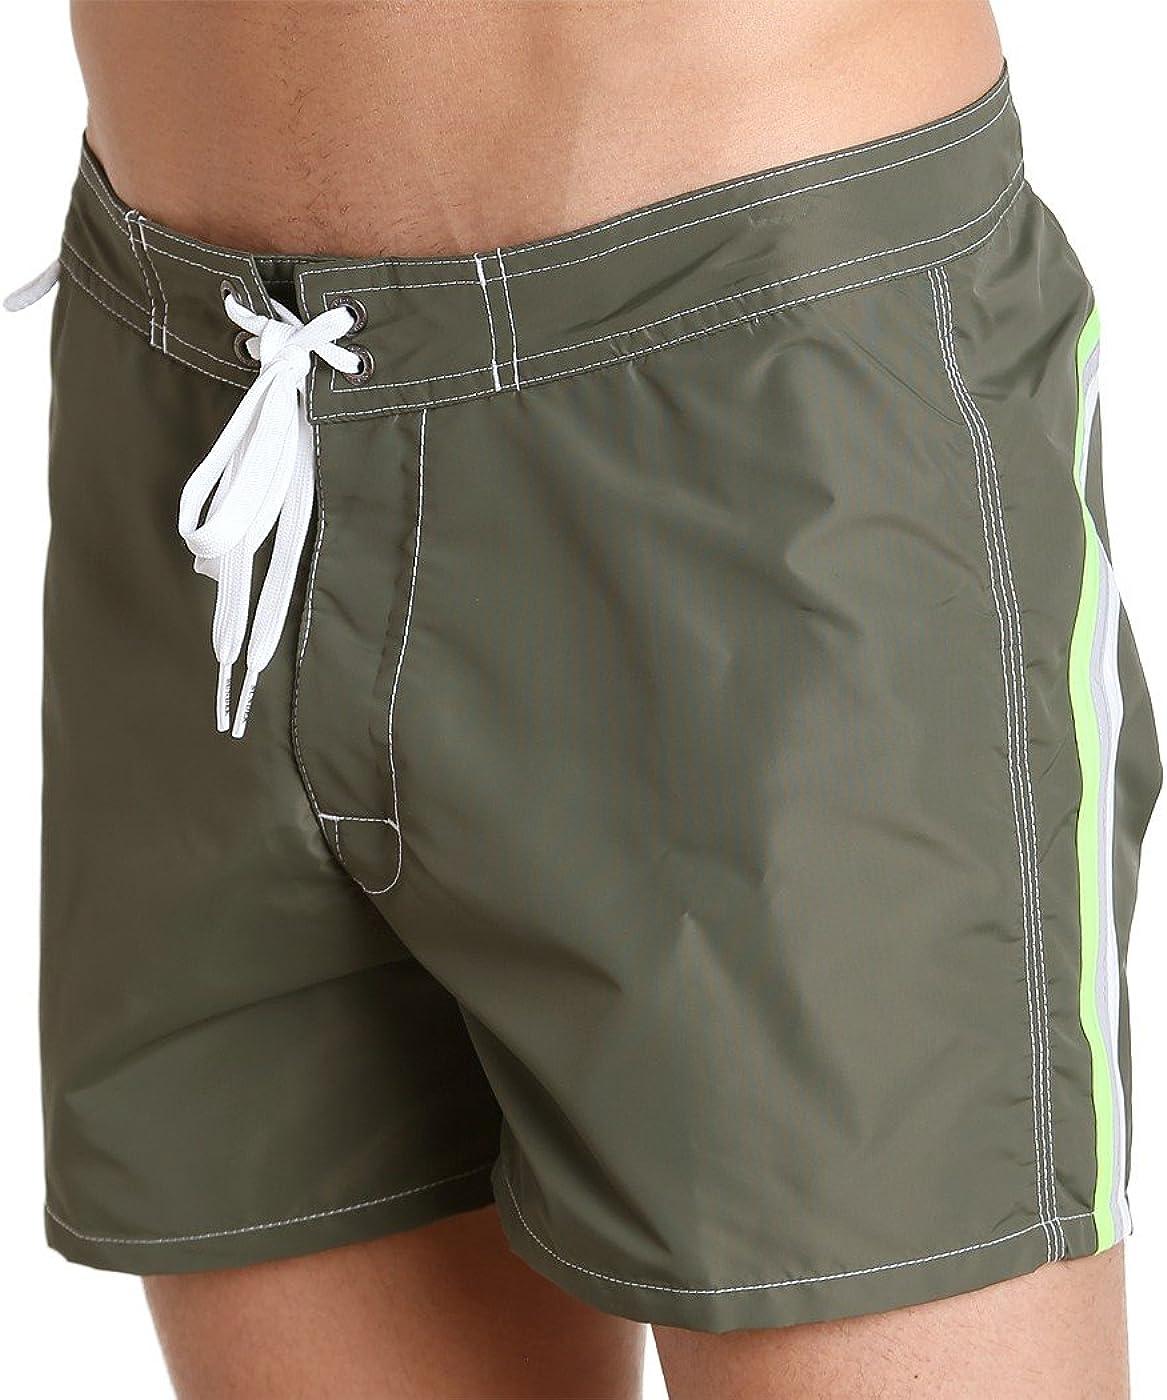 SUNDEK Low Rise Pantalones Cortos para Hombre